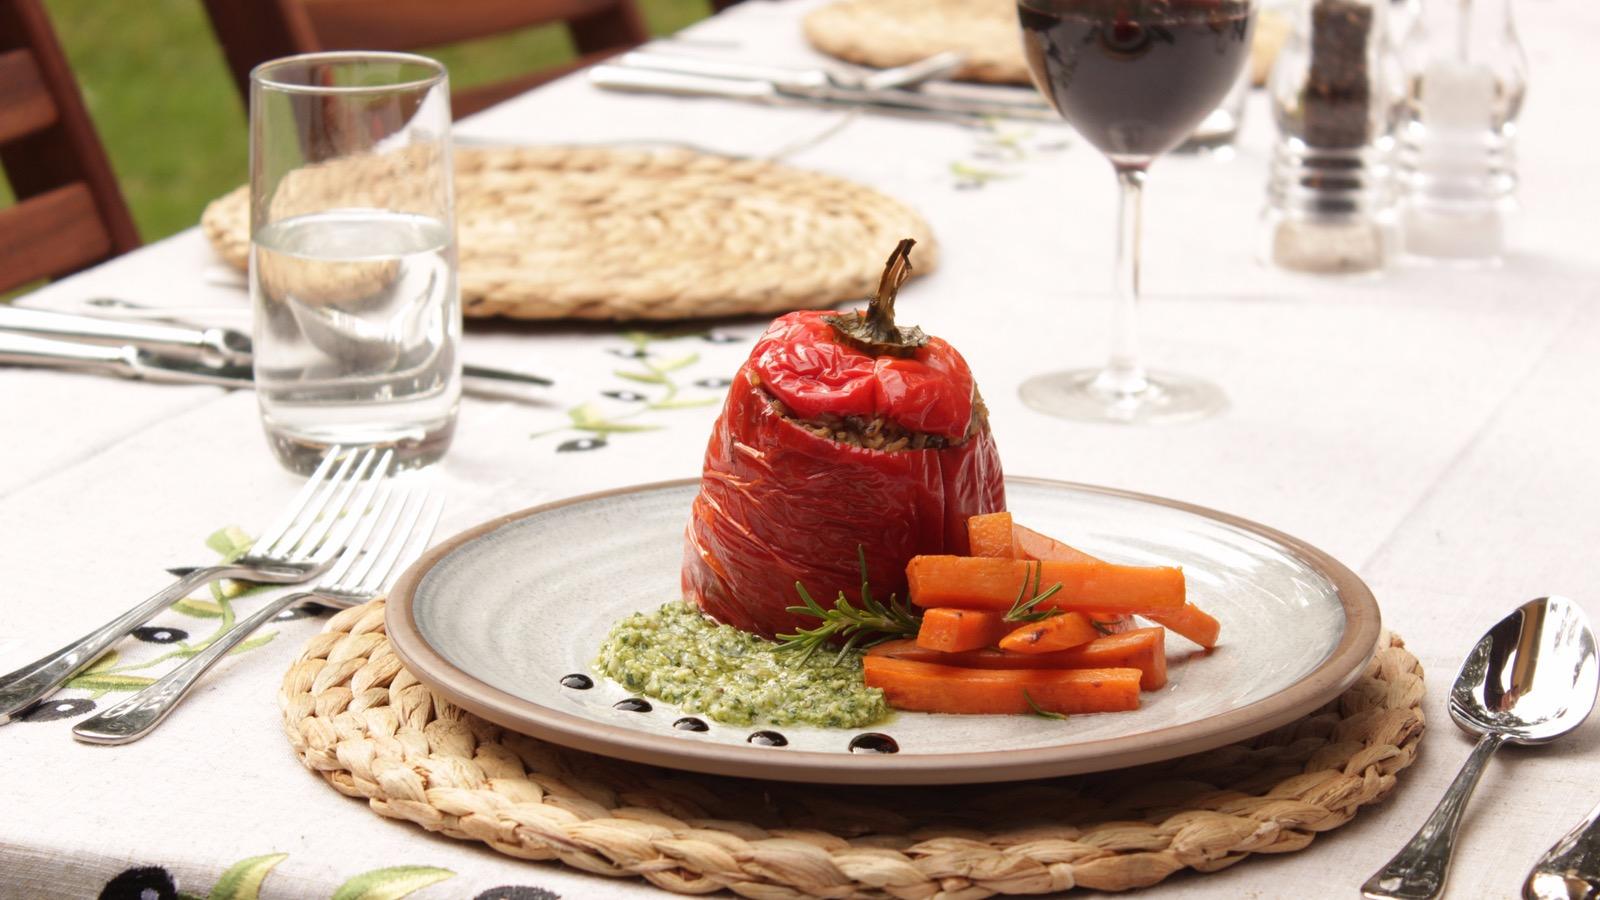 Greek Pepper Stuffed w/ Lamb Mince & Rice served w/ Homemade Basil Pesto